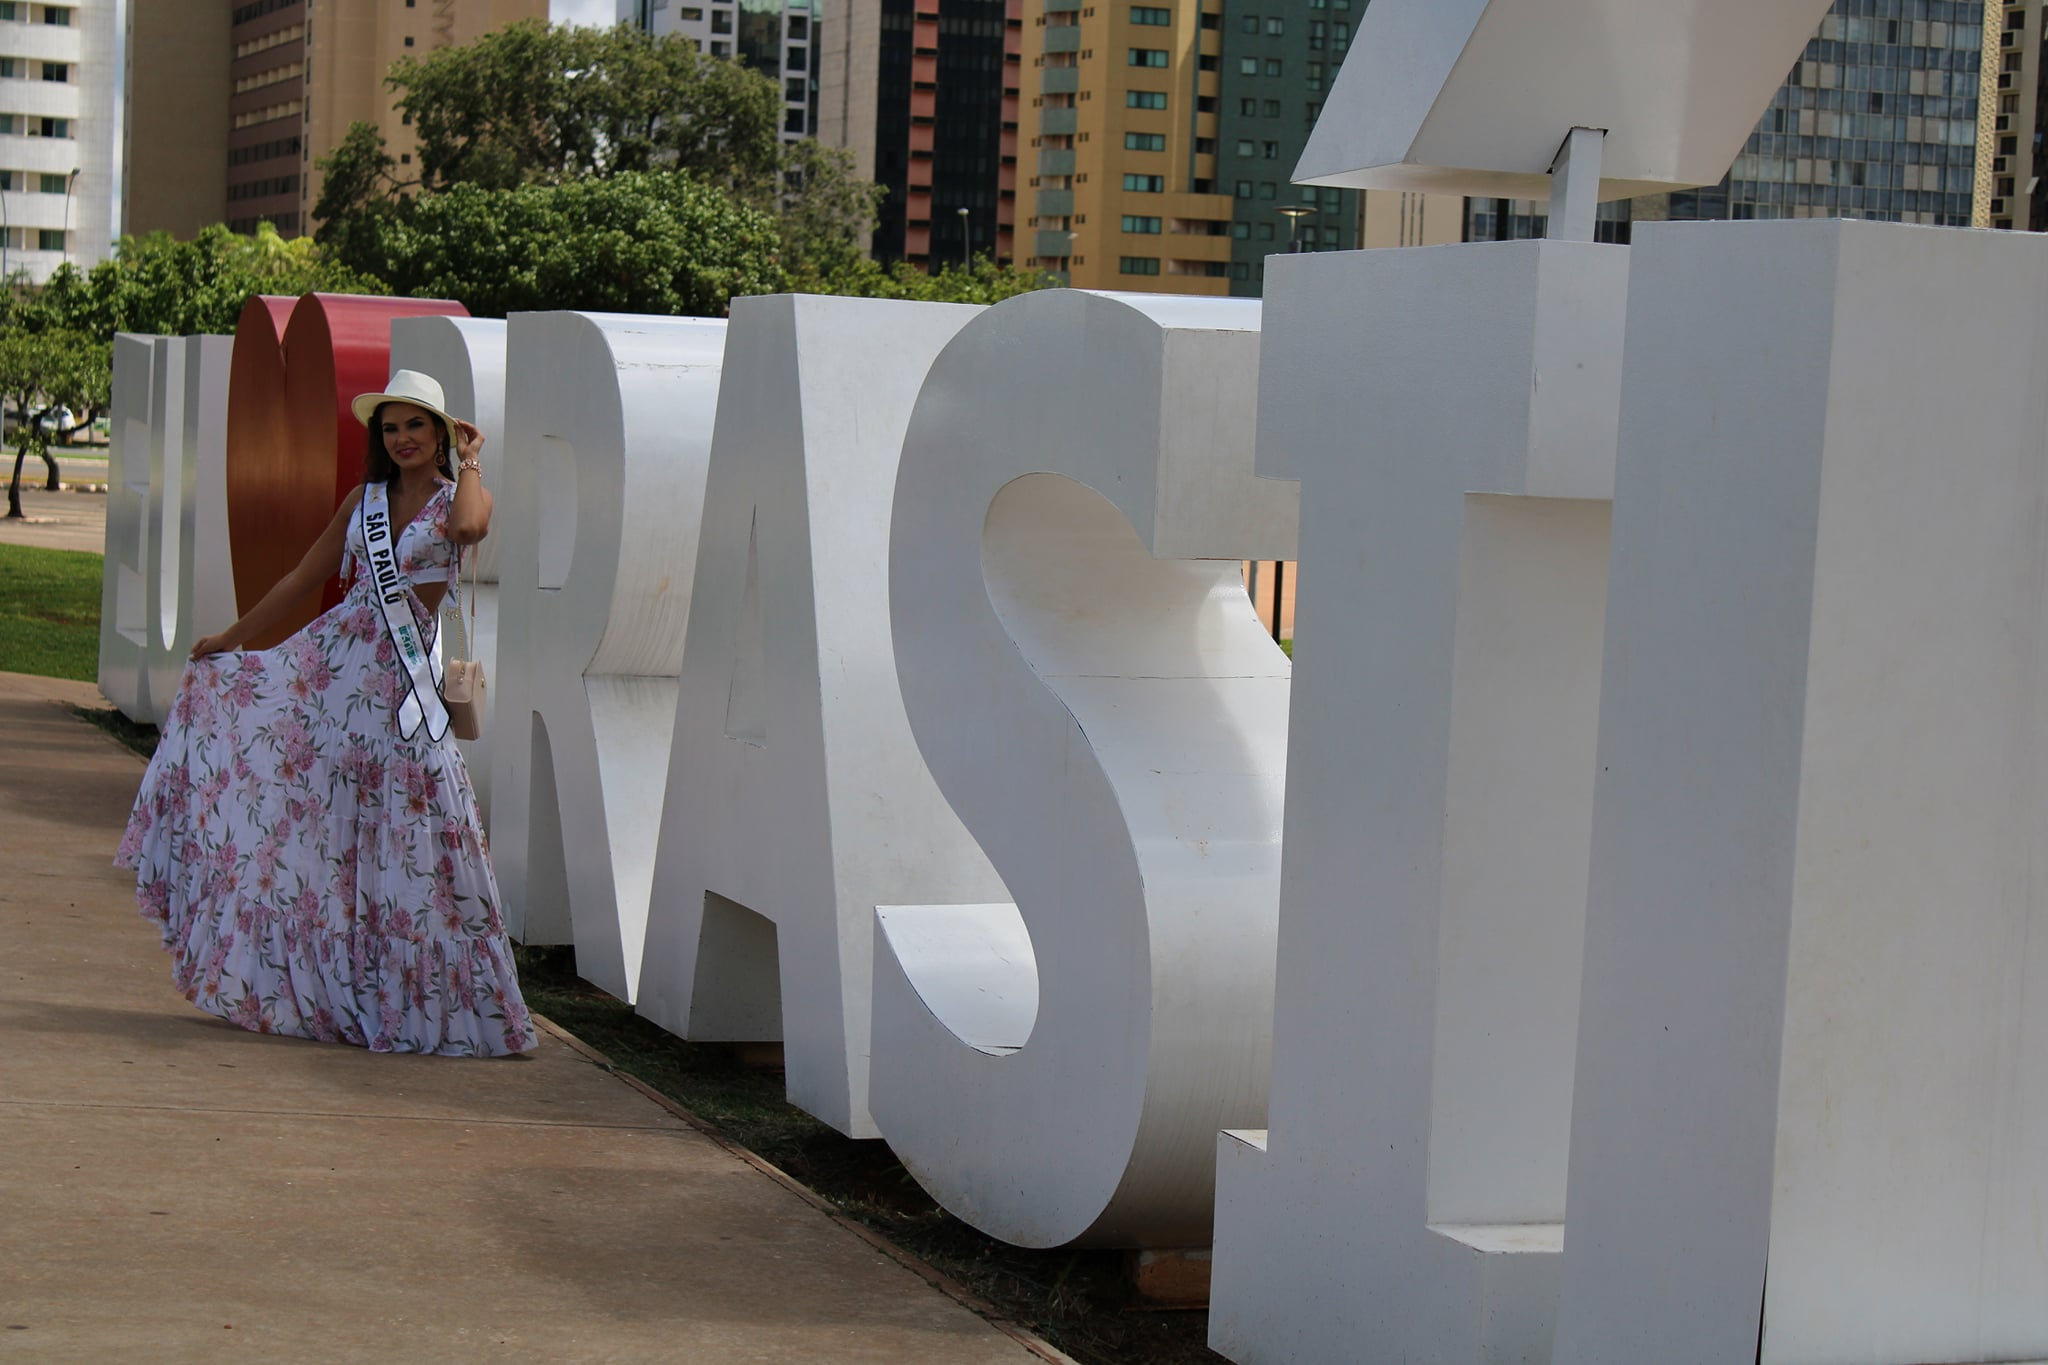 jessica caroline costa, nlatinoamericana universal 2021/top 5 de miss supranational brazil 2020/miss grand paraiba 2019/miss vale do paraiba mundo 2018. - Página 8 12580810